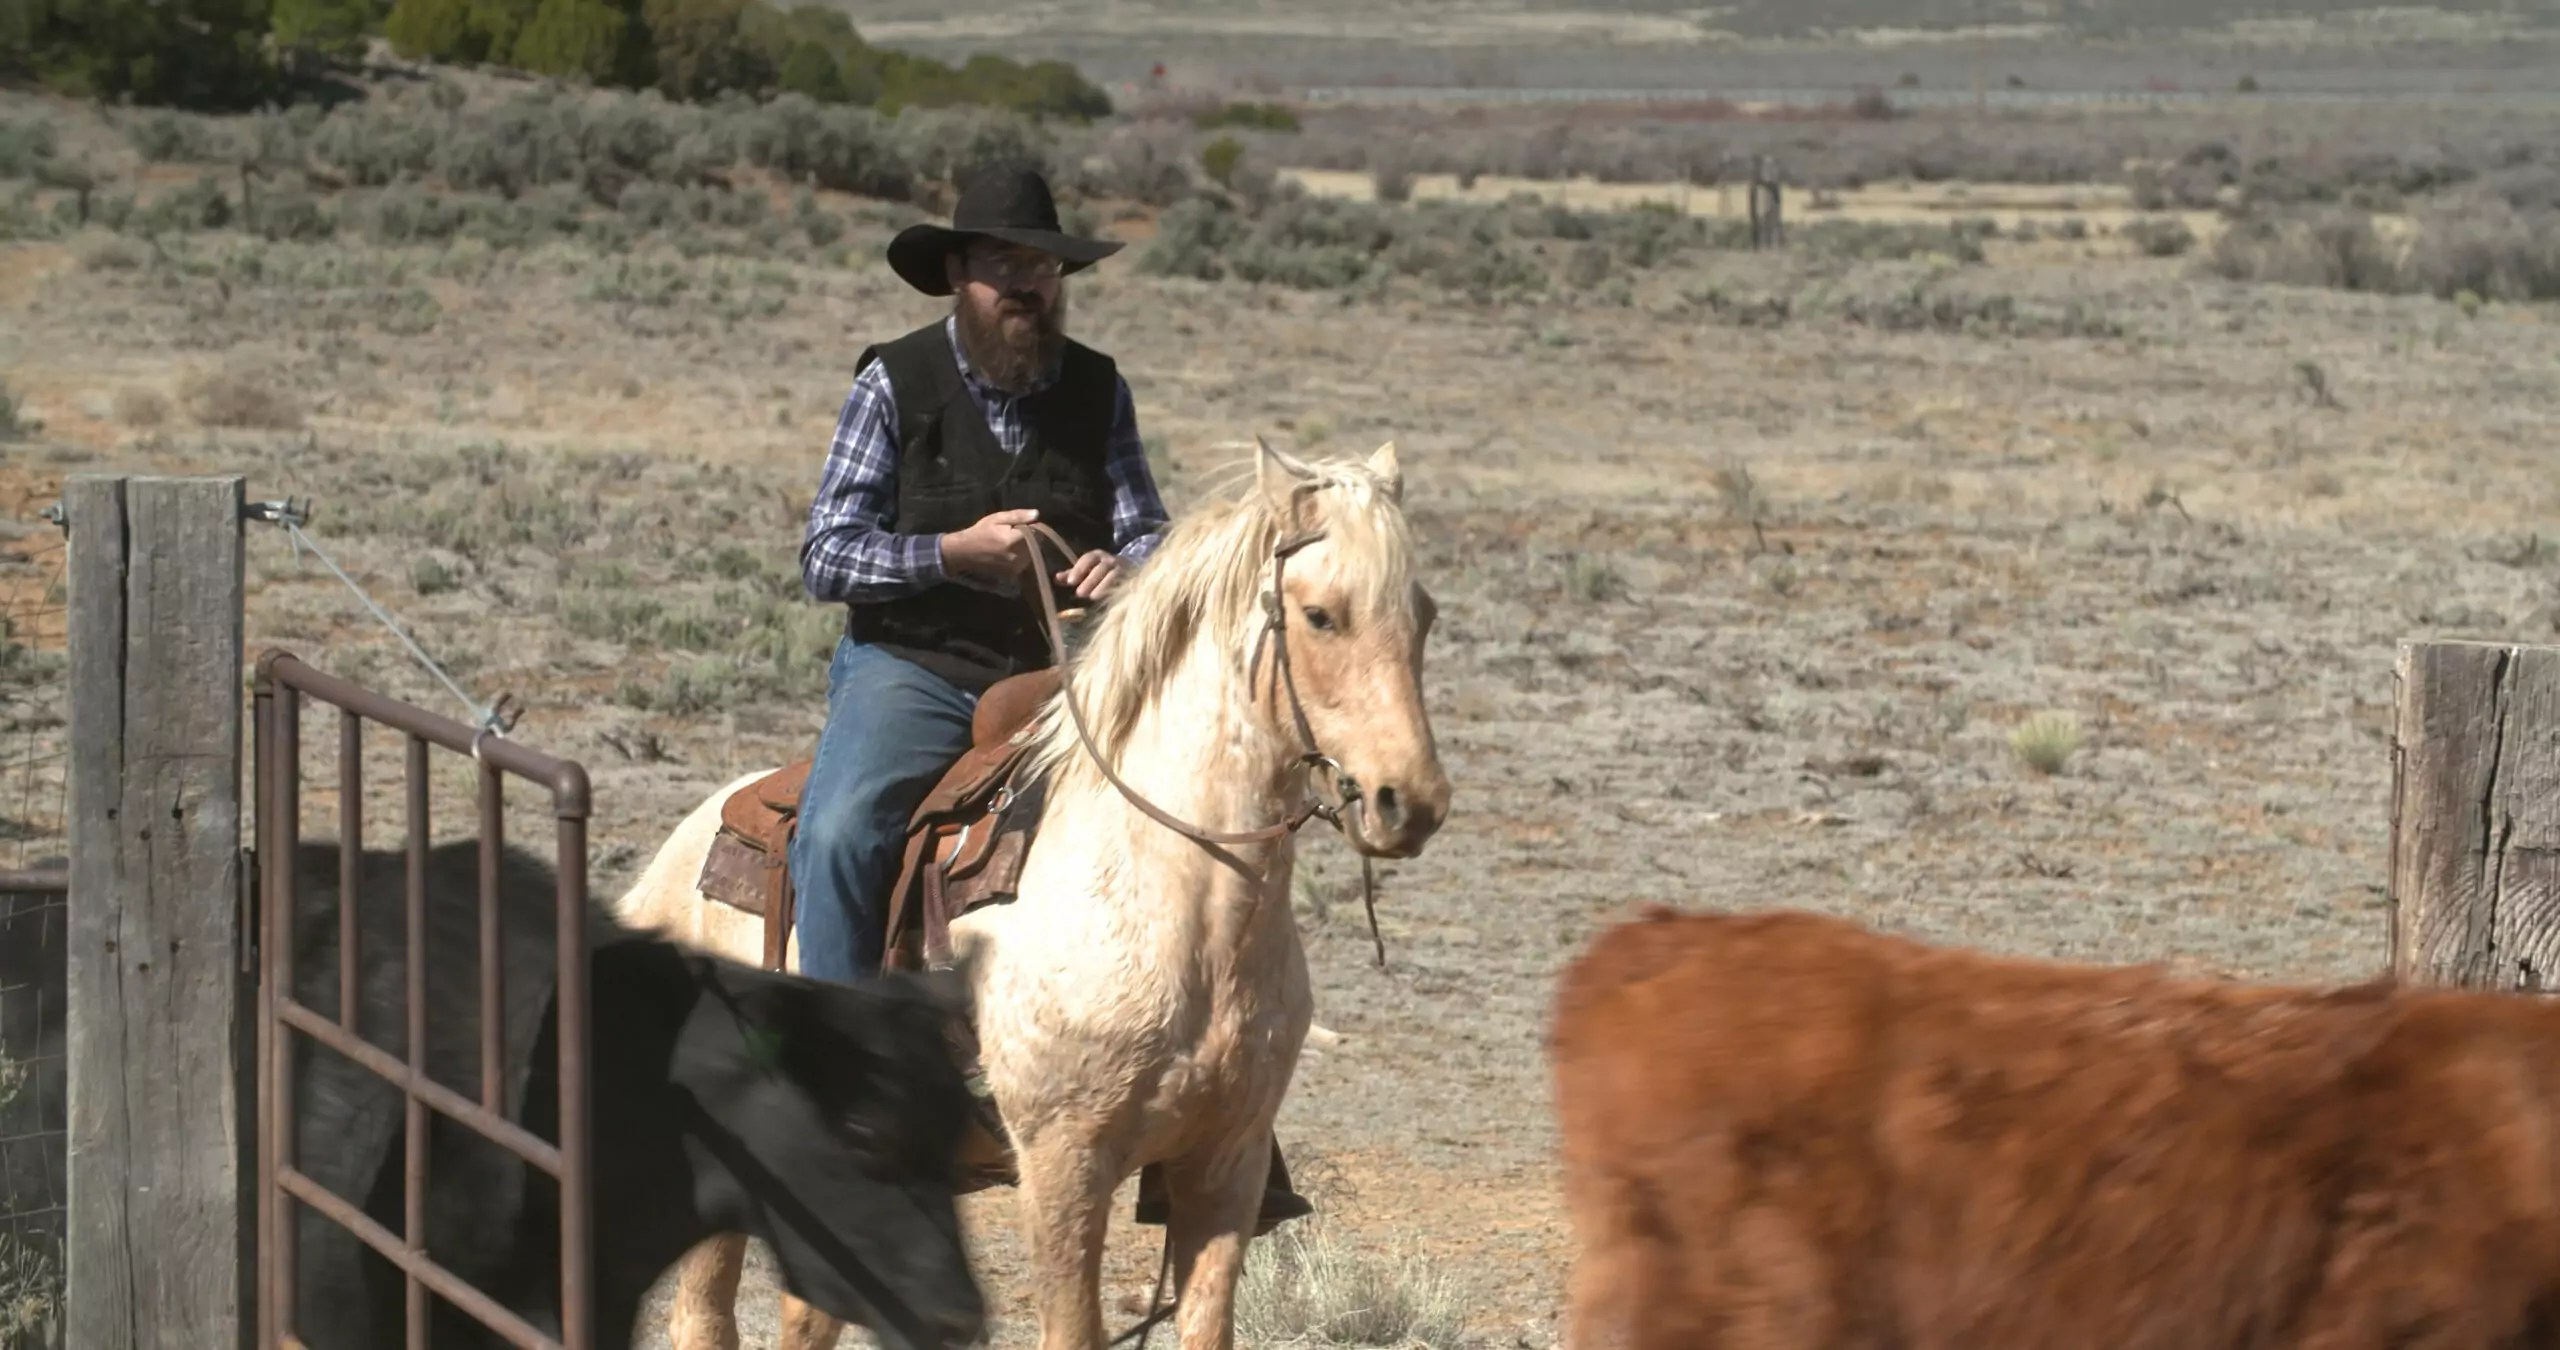 A man sitting on horseback near cattle.